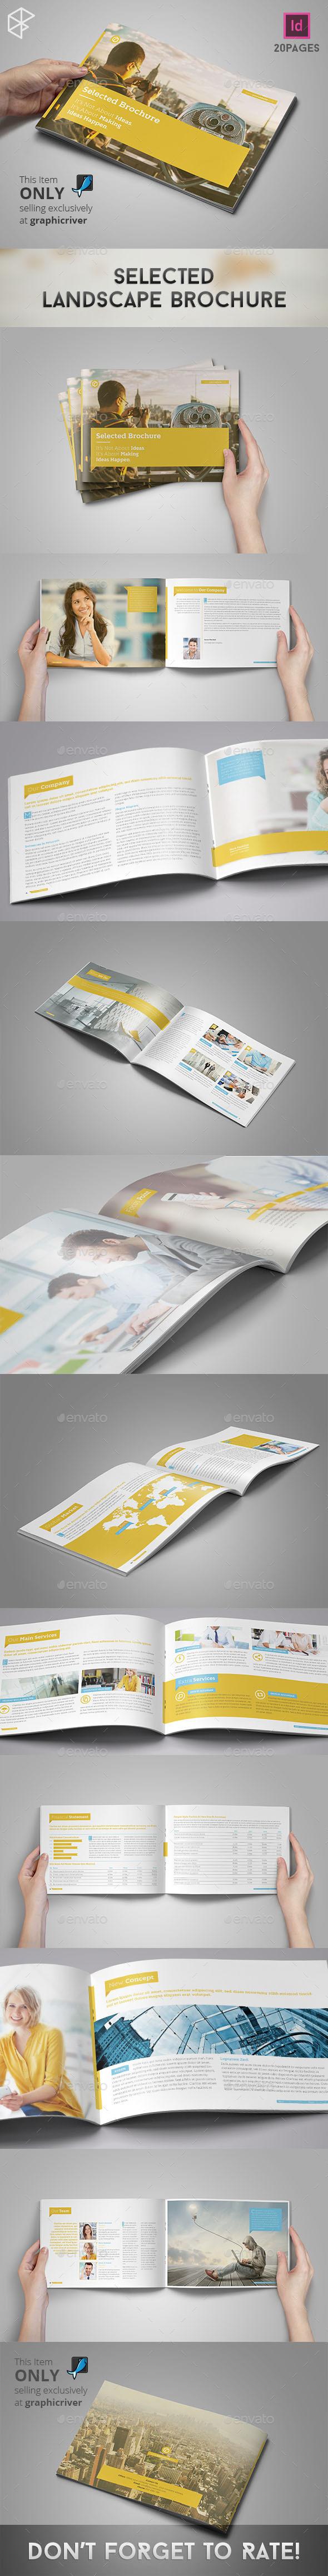 GraphicRiver Selected Landscape Brochure 11458975